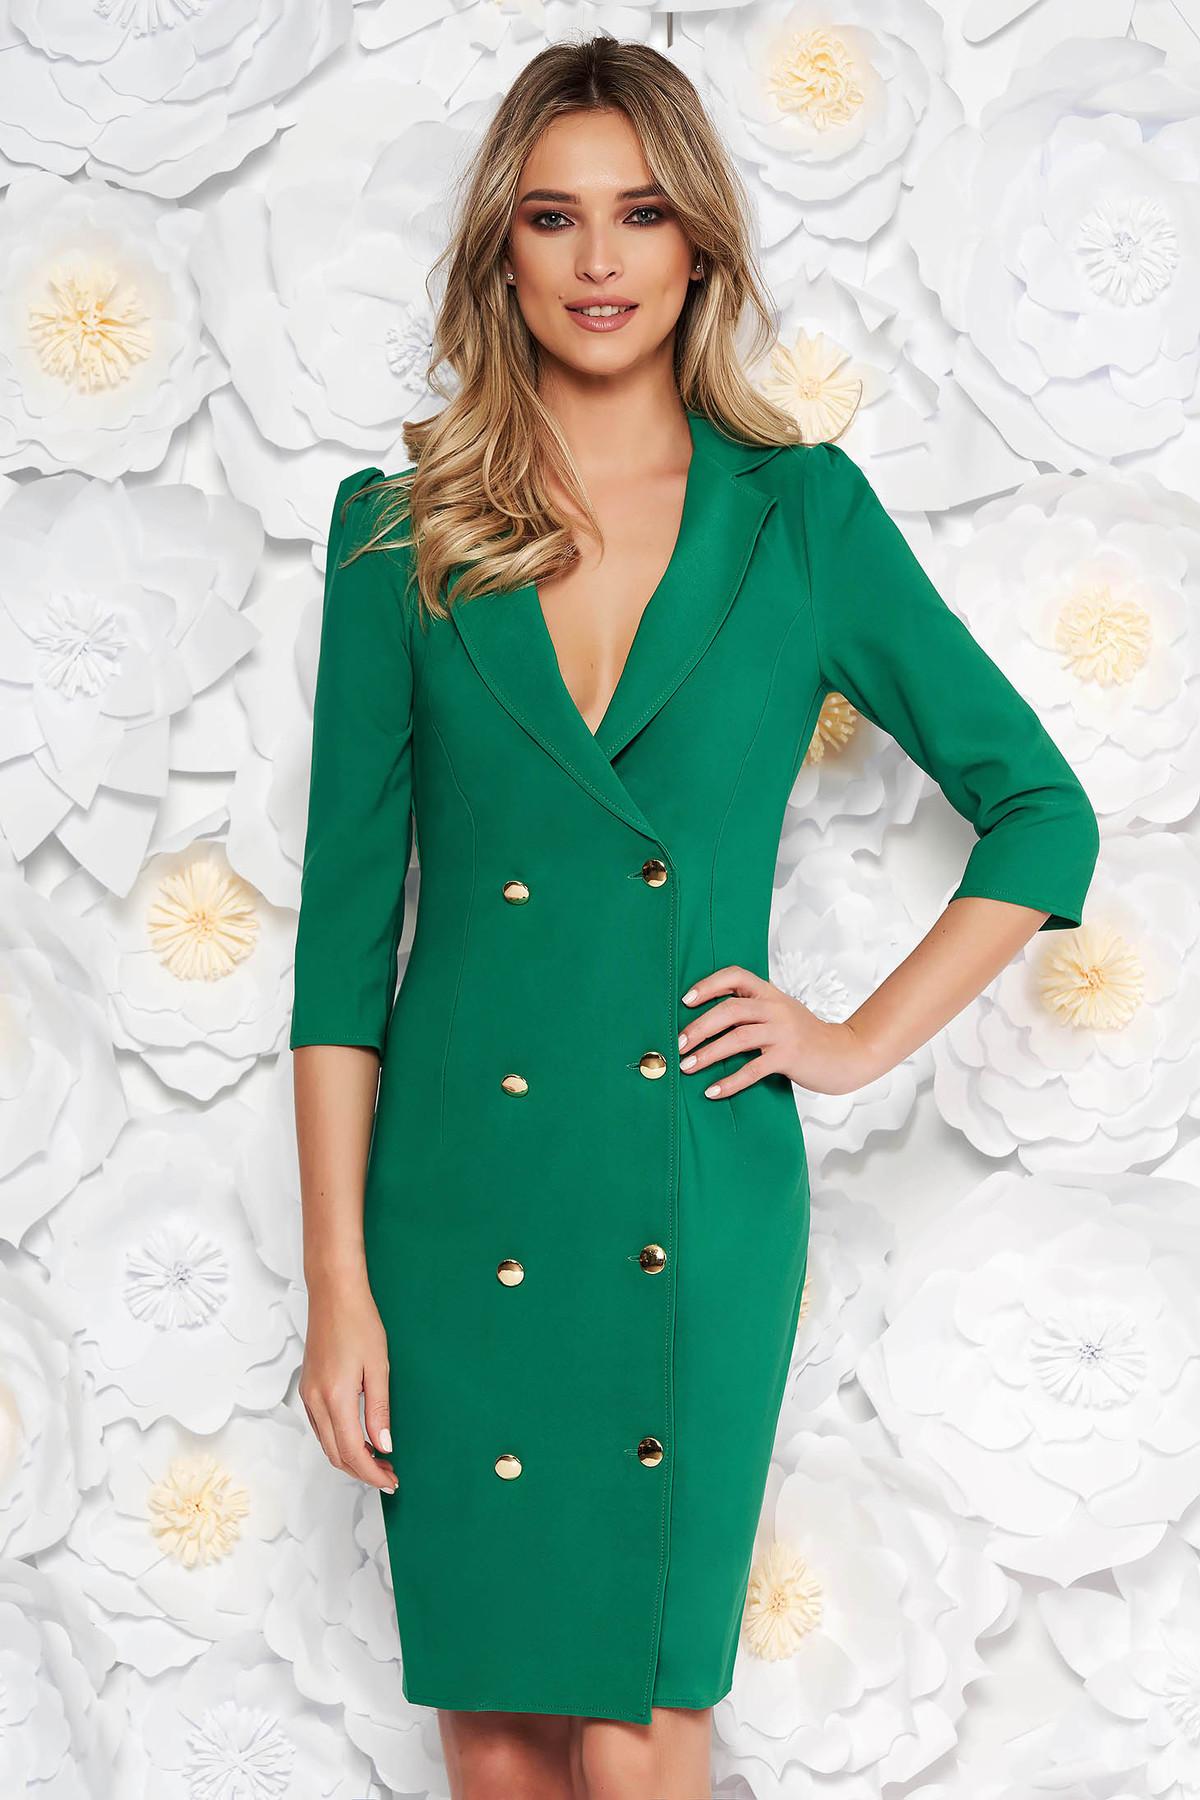 Rochie Artista verde de zi din stofa usor elastica cu maneci trei-sferturi cu decolteu in v